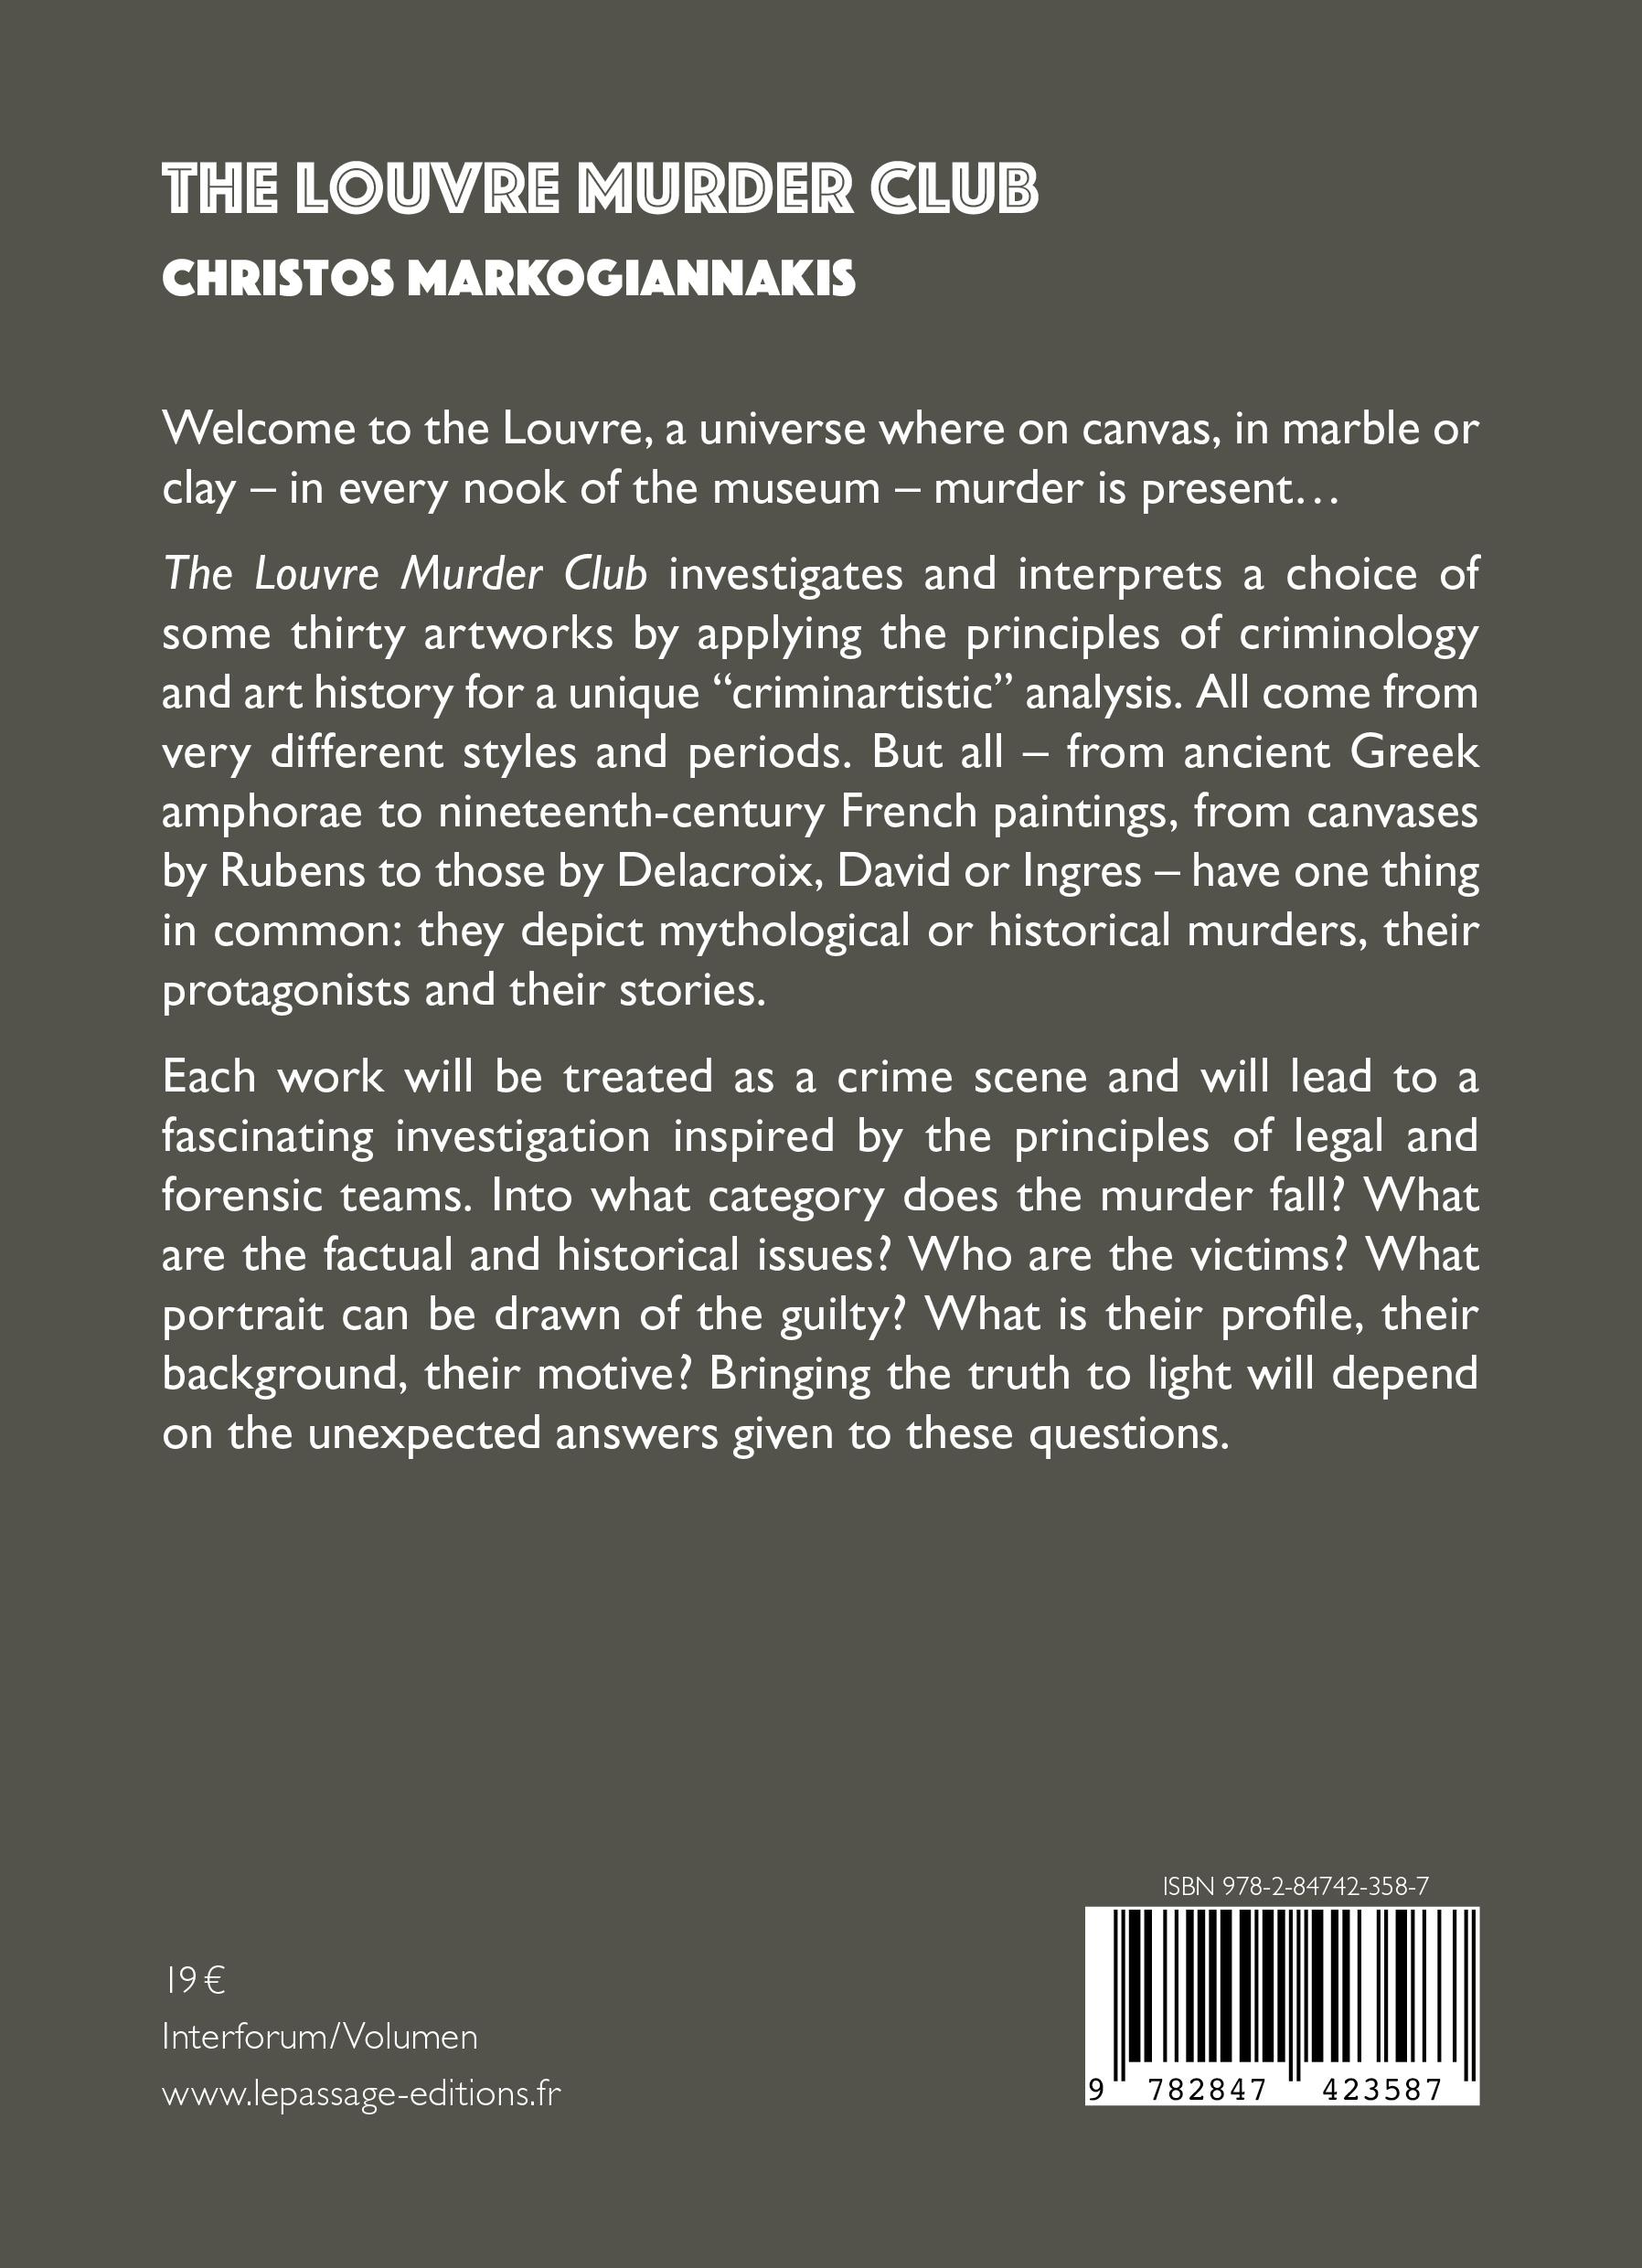 The_Louvre_Murder_Cl#769245